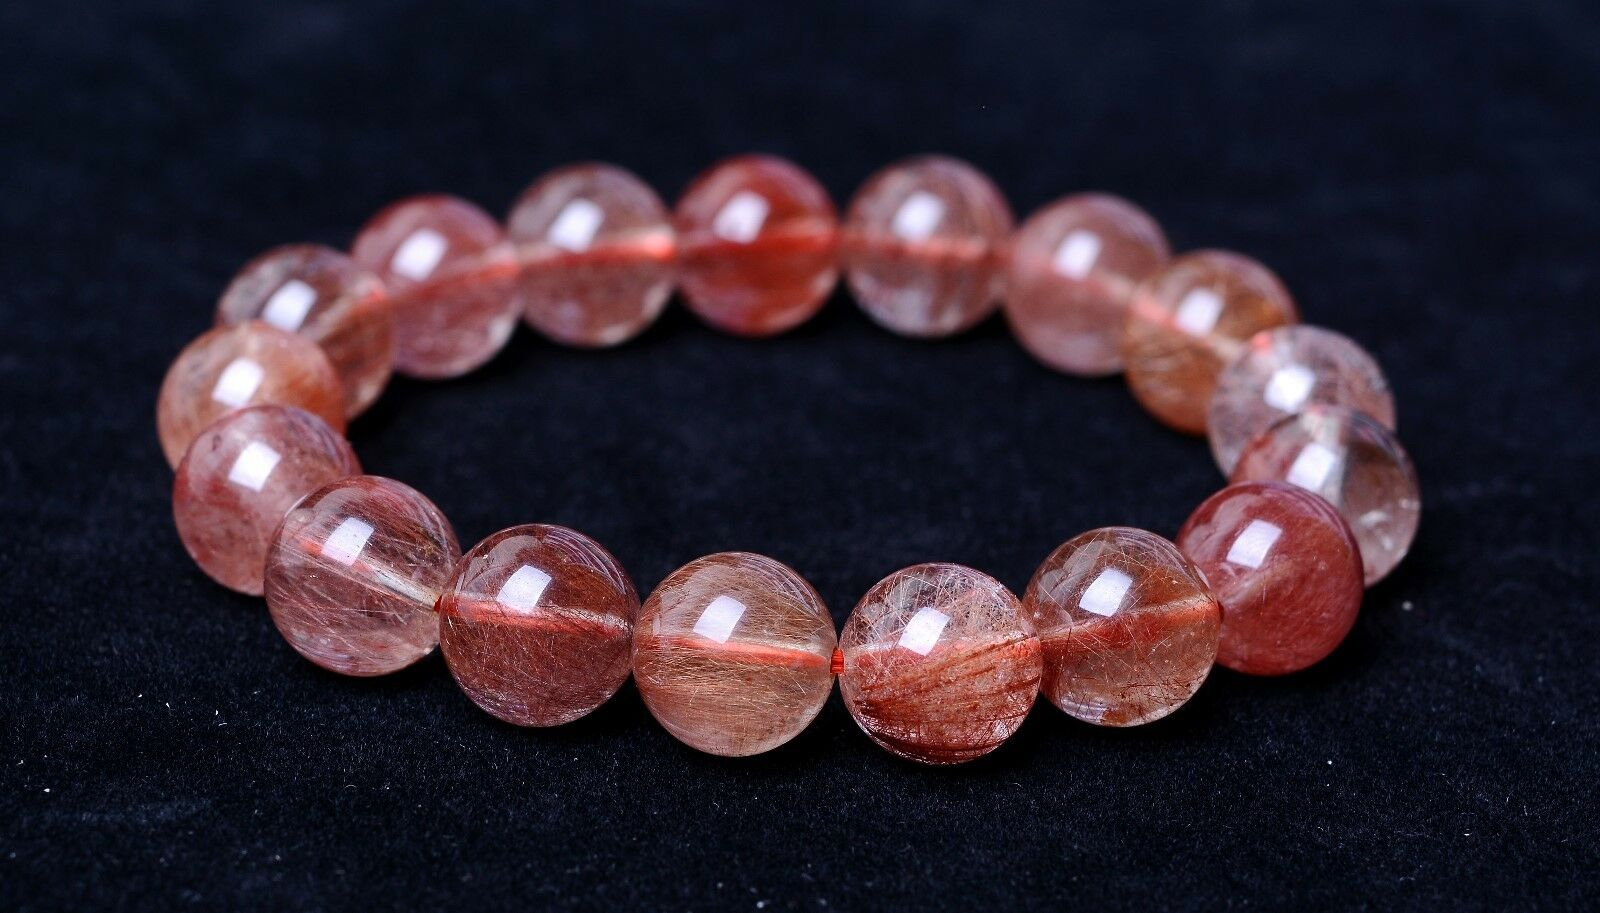 Natural gold Red Hair Rutilated Quartz Crystal Beads Healing Bracelet 13mm